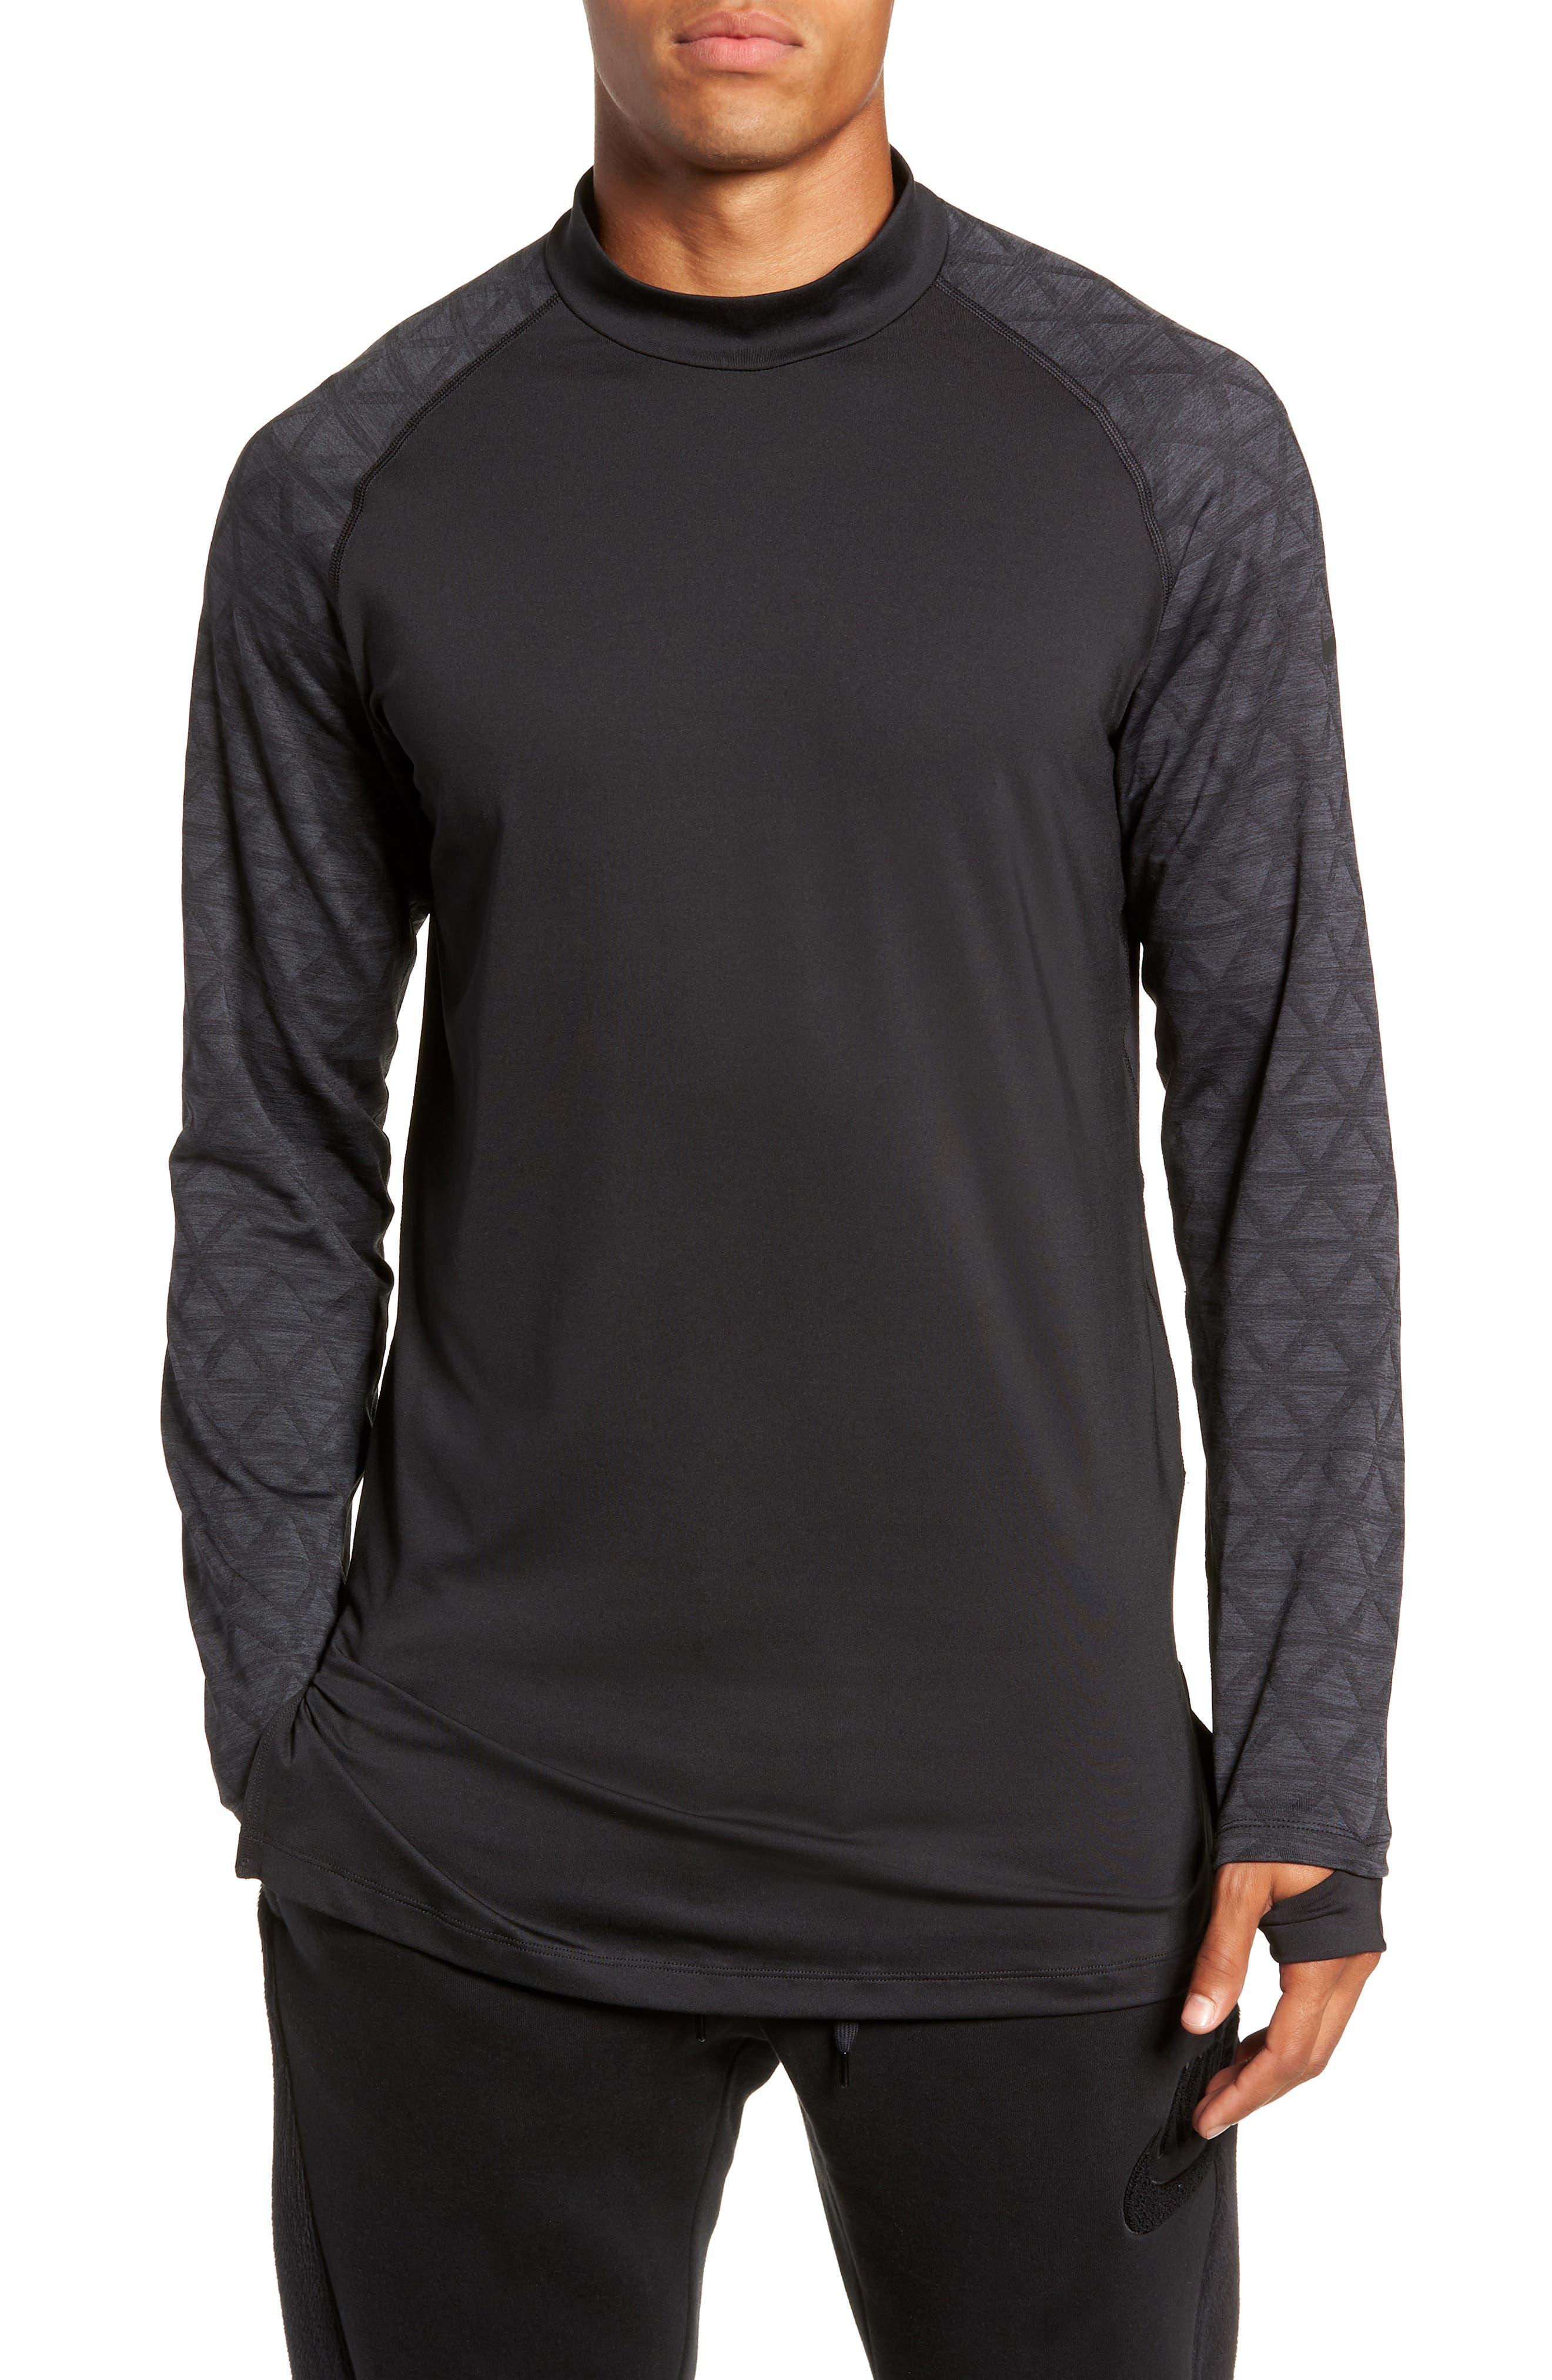 NIKE Niko Pro Therma Long Sleeve Mock Neck T-Shirt, Main, color, 010